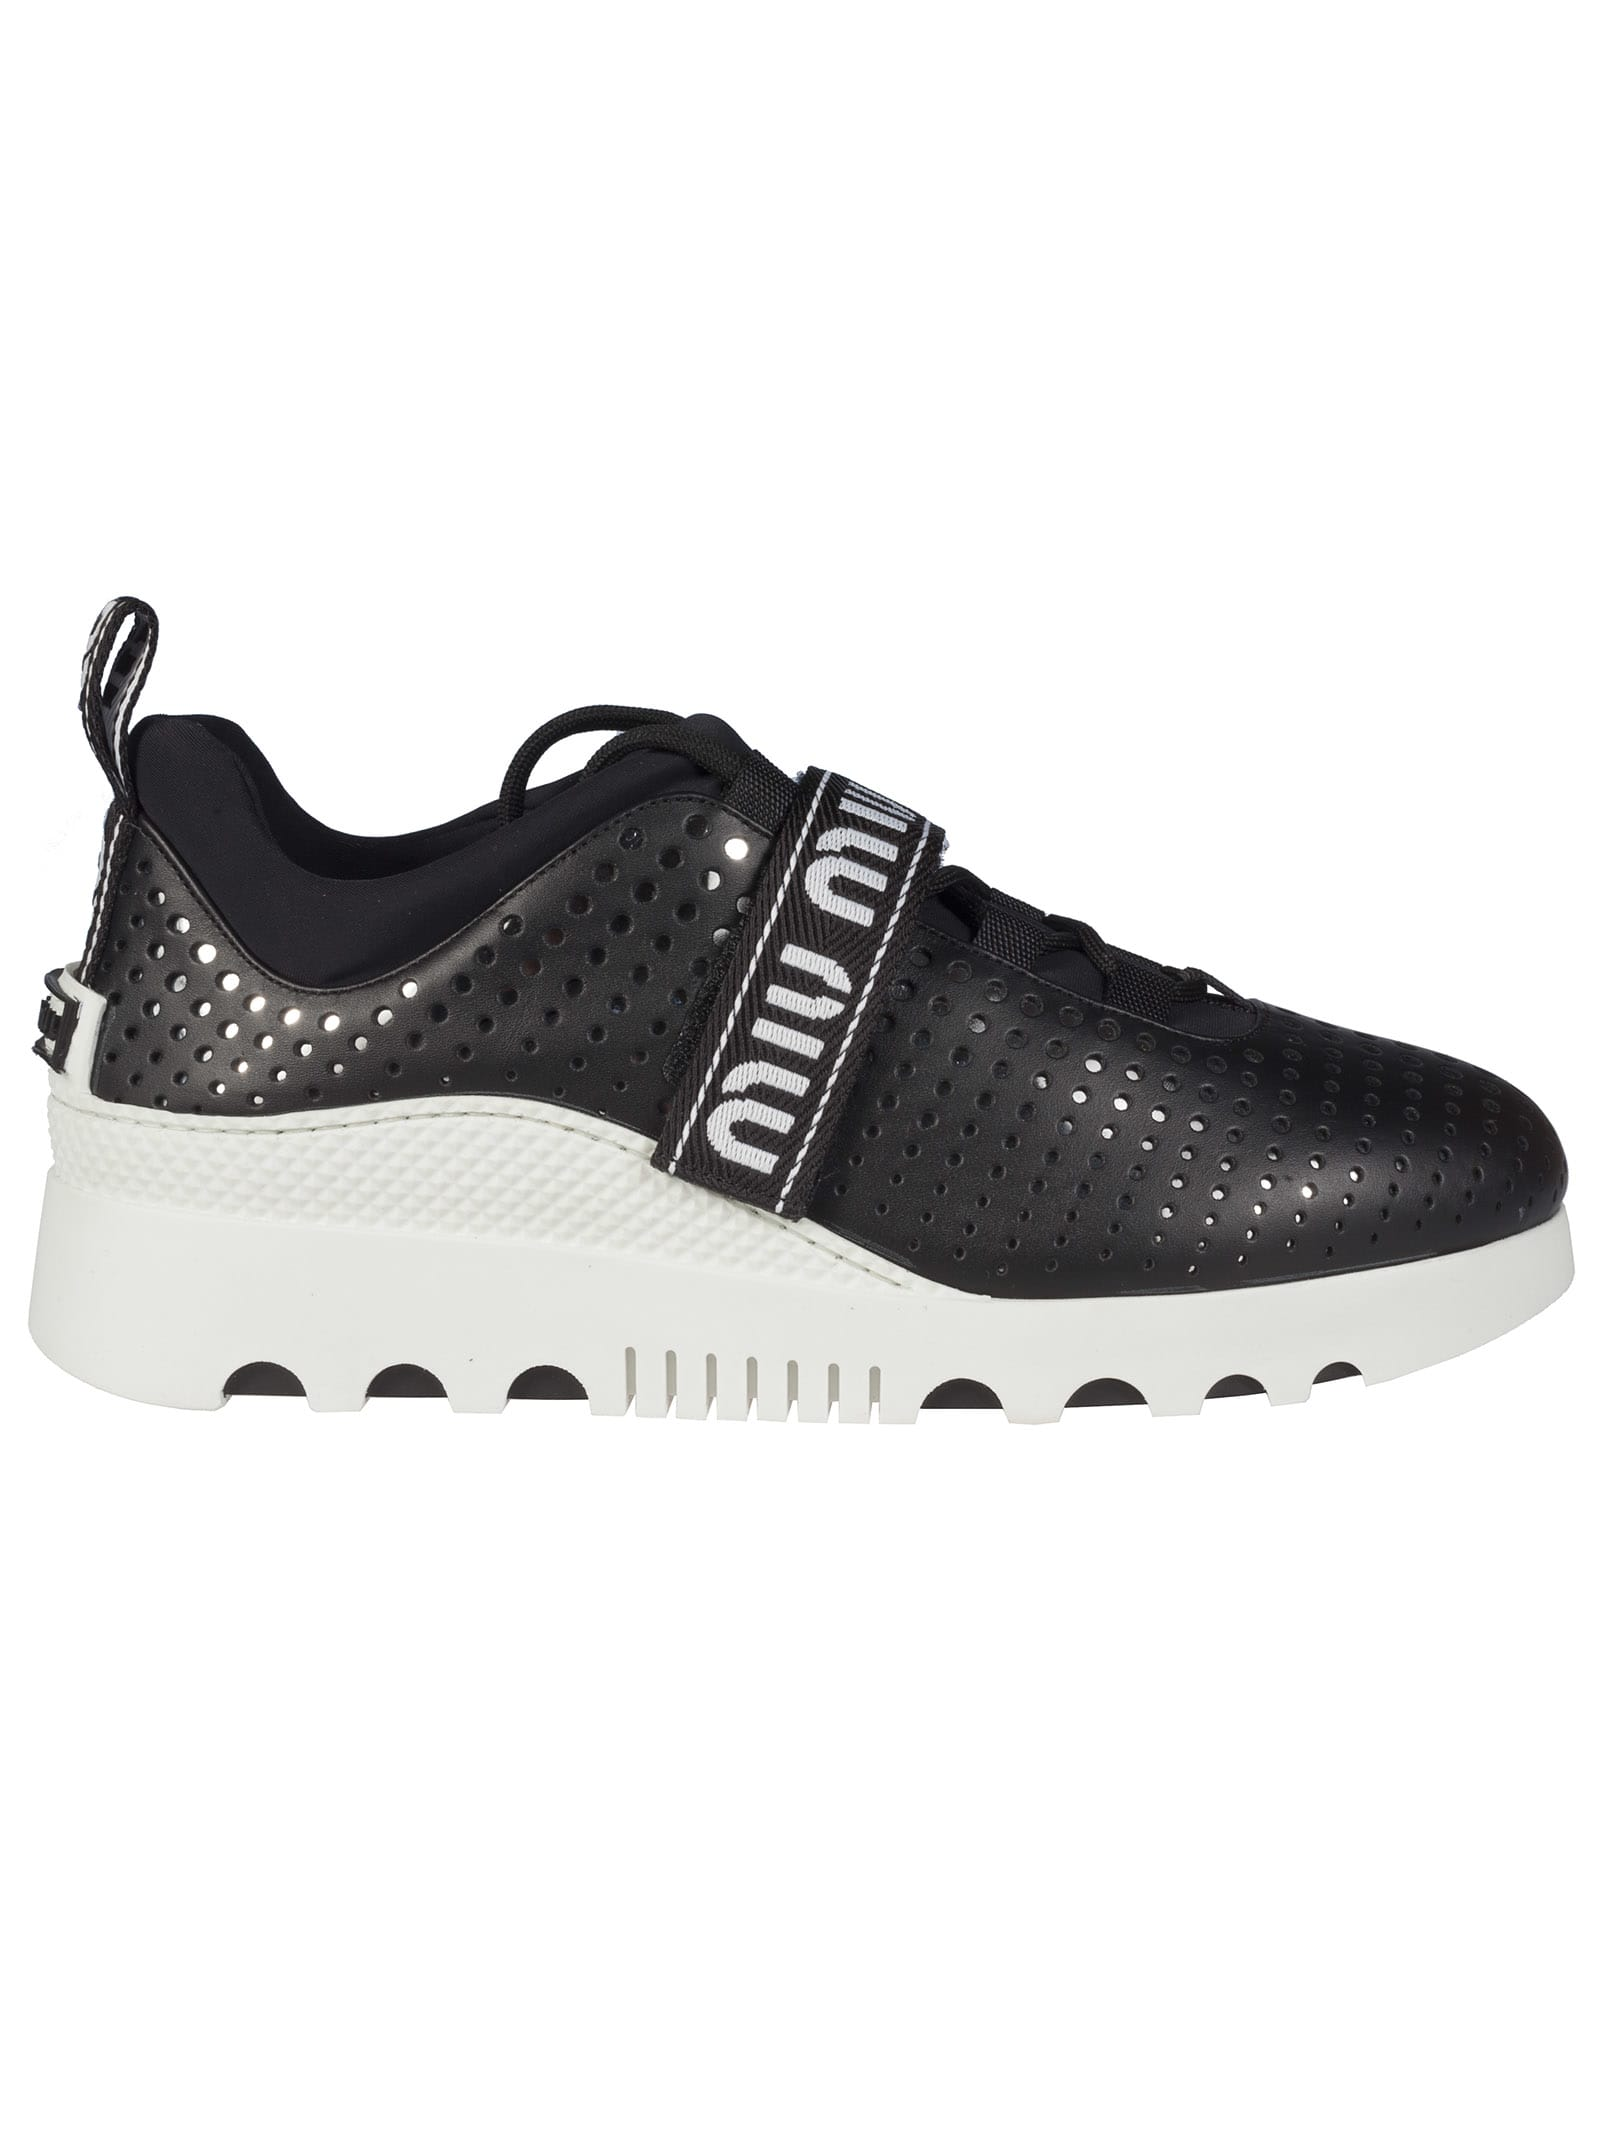 official photos 2bc2f af842 Miu Miu Perforated Sneakers